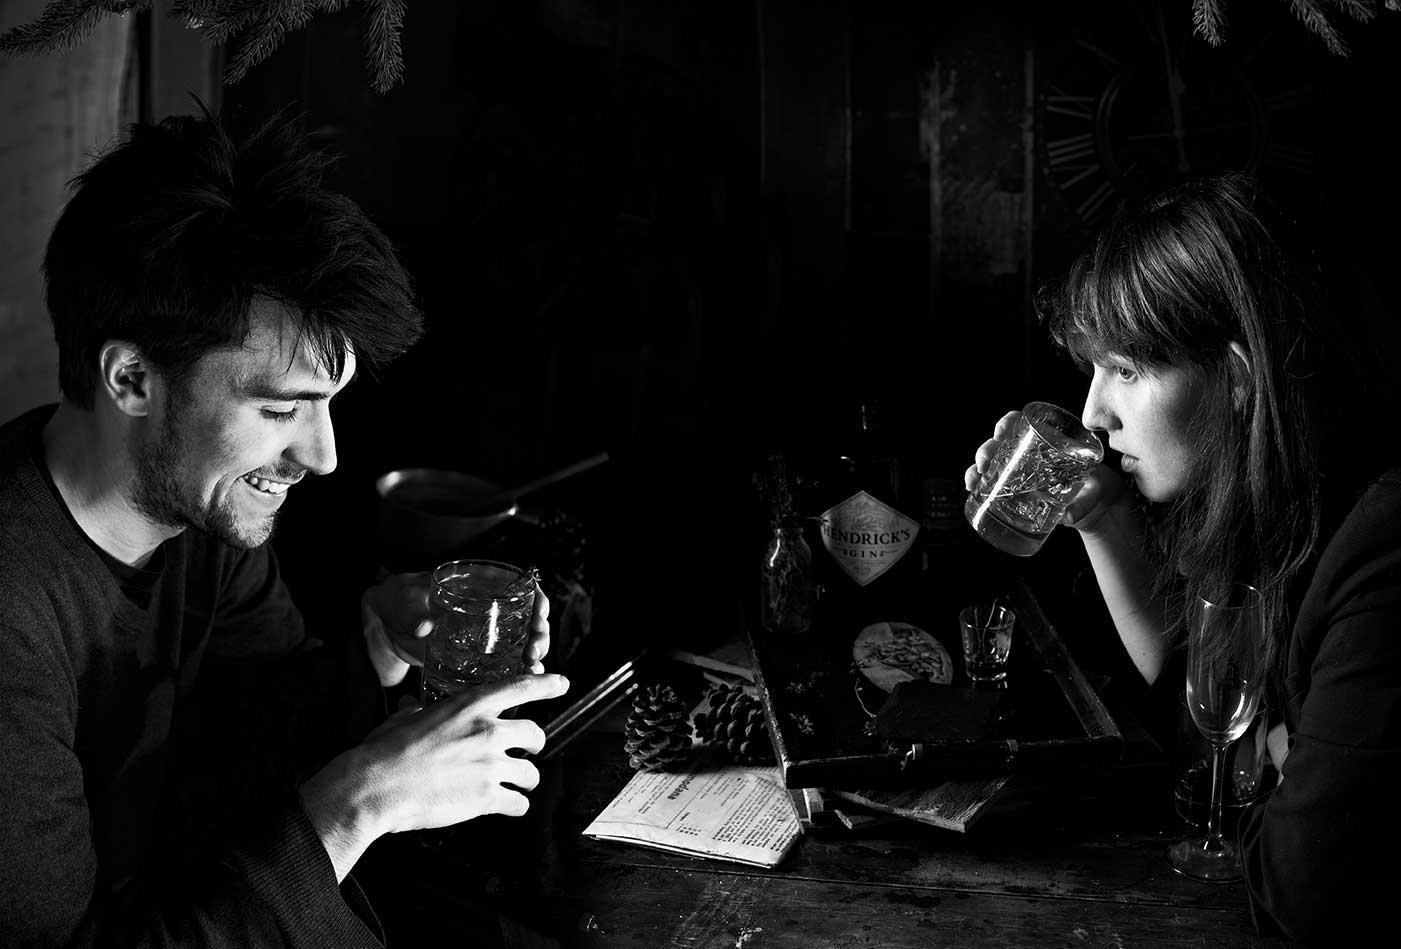 Barman – Bartender